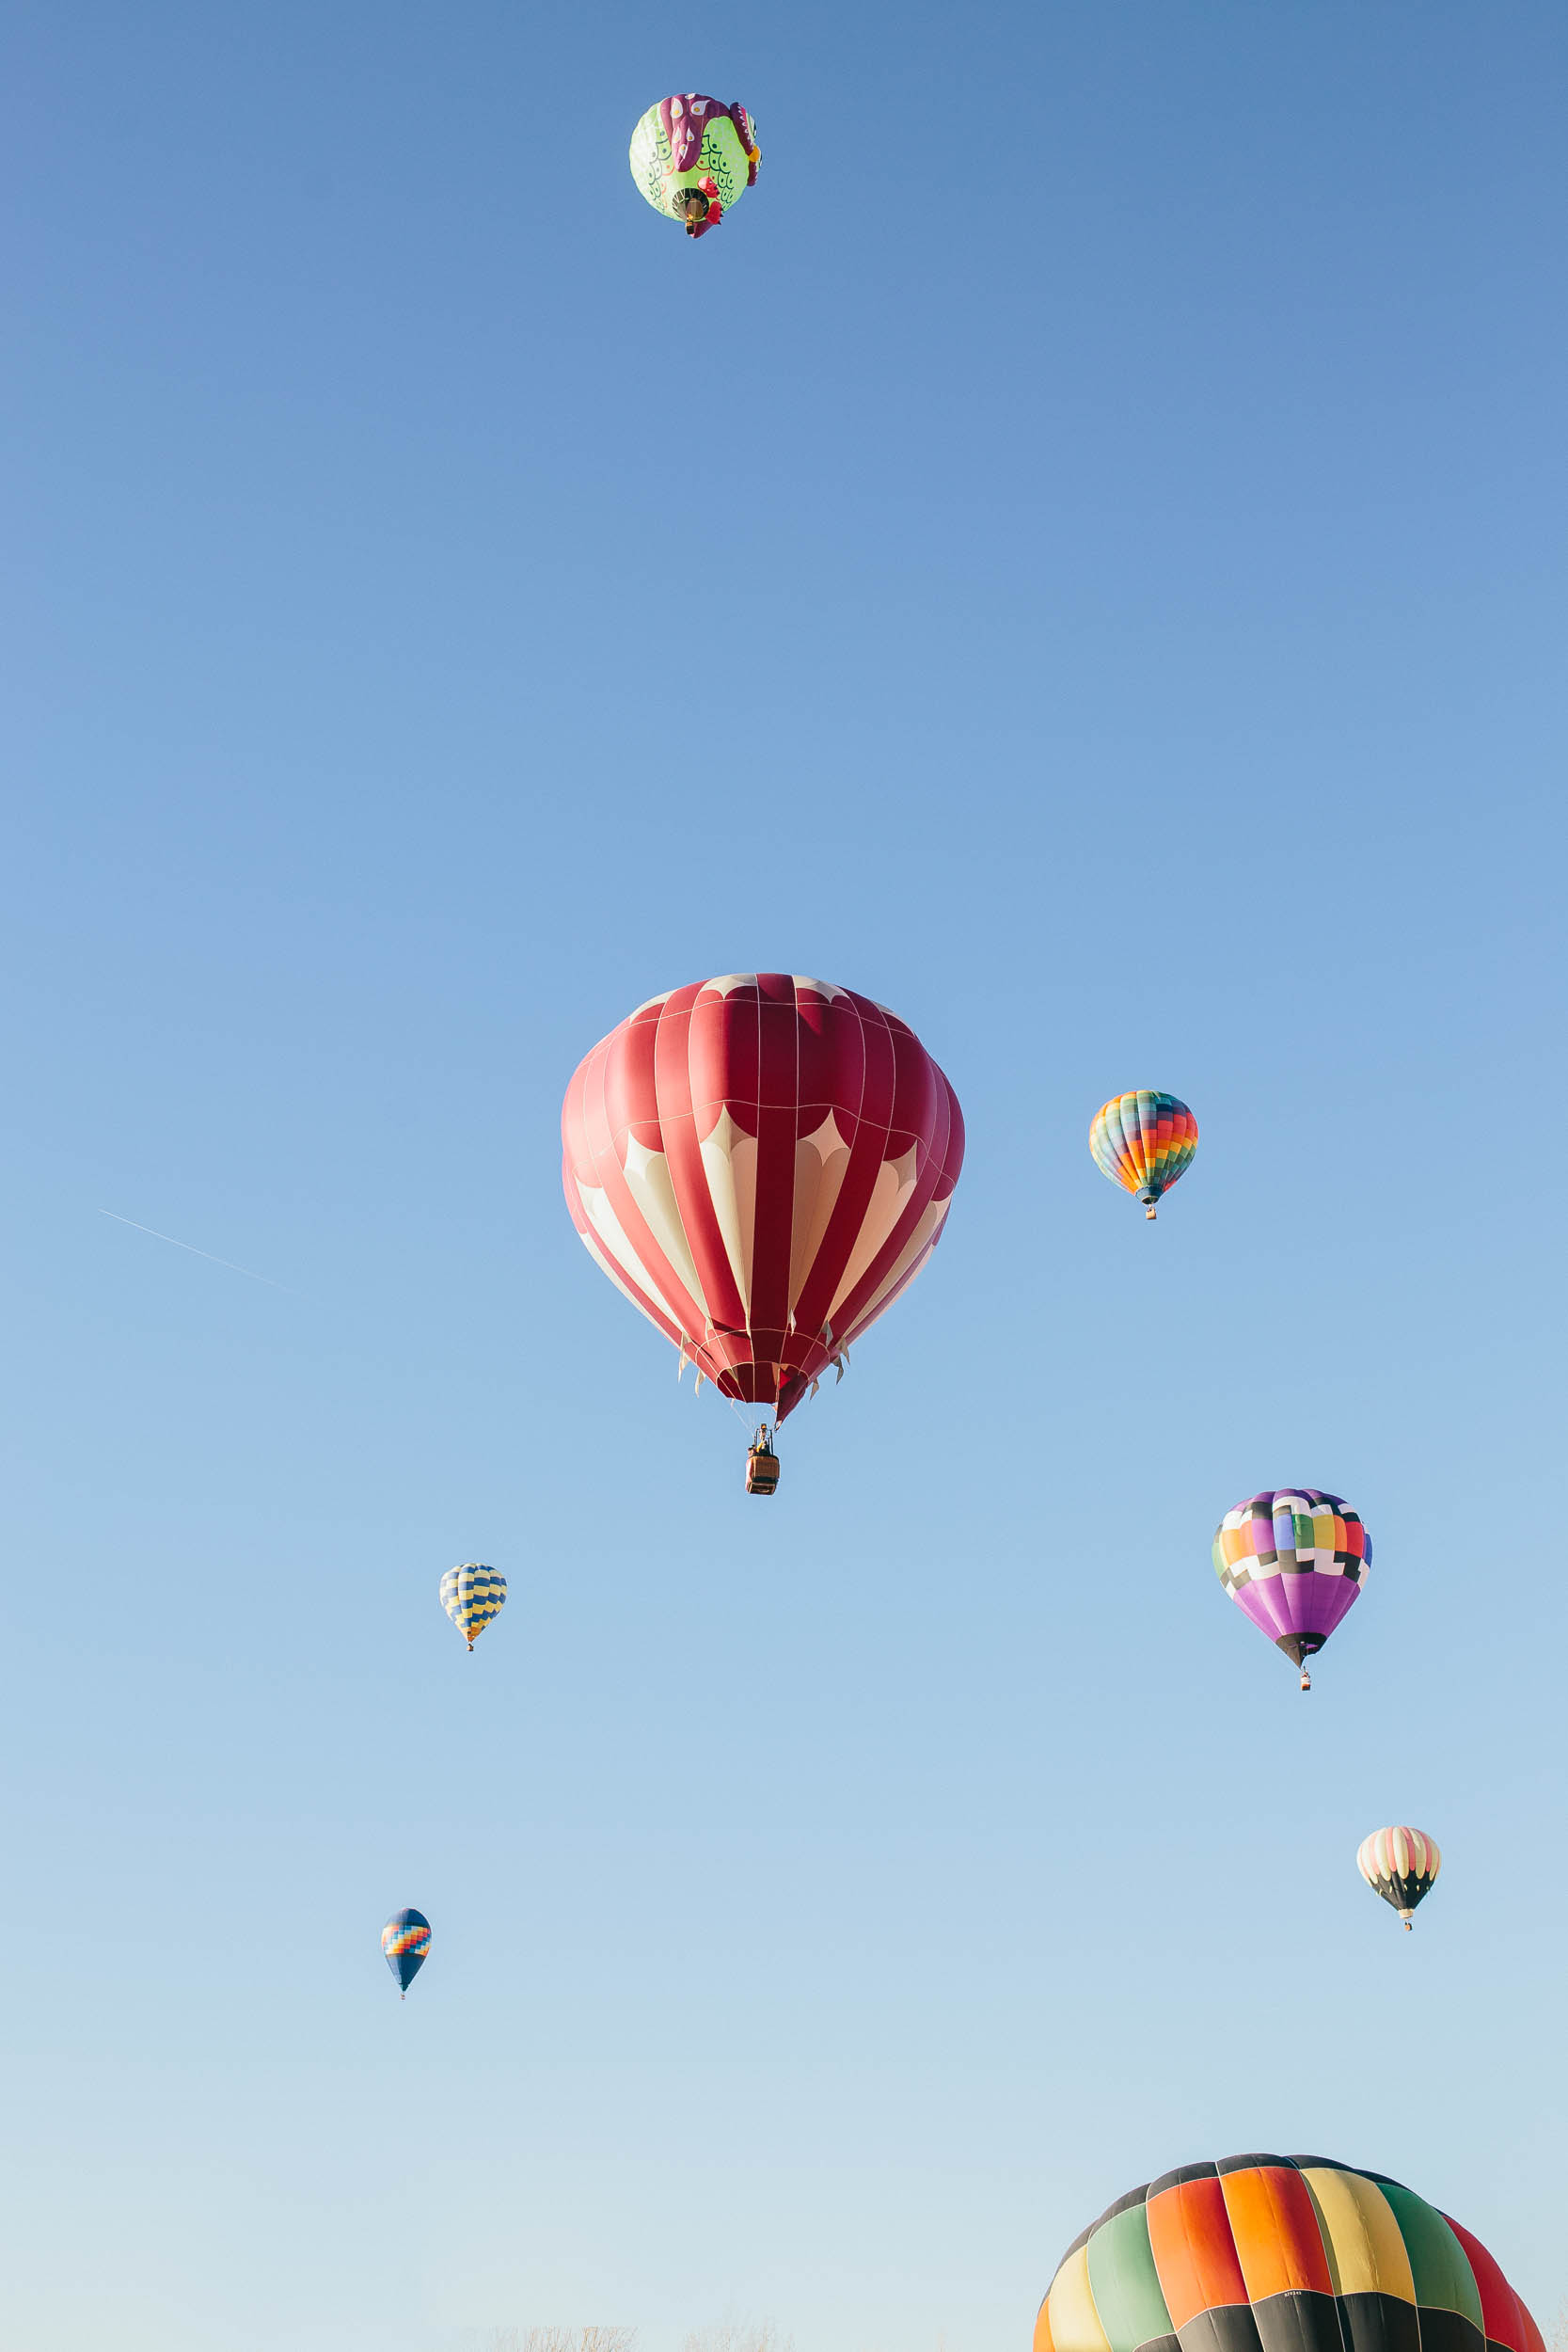 Kyle-Sheppard-Kanab-Balloon-Festival-18.jpg